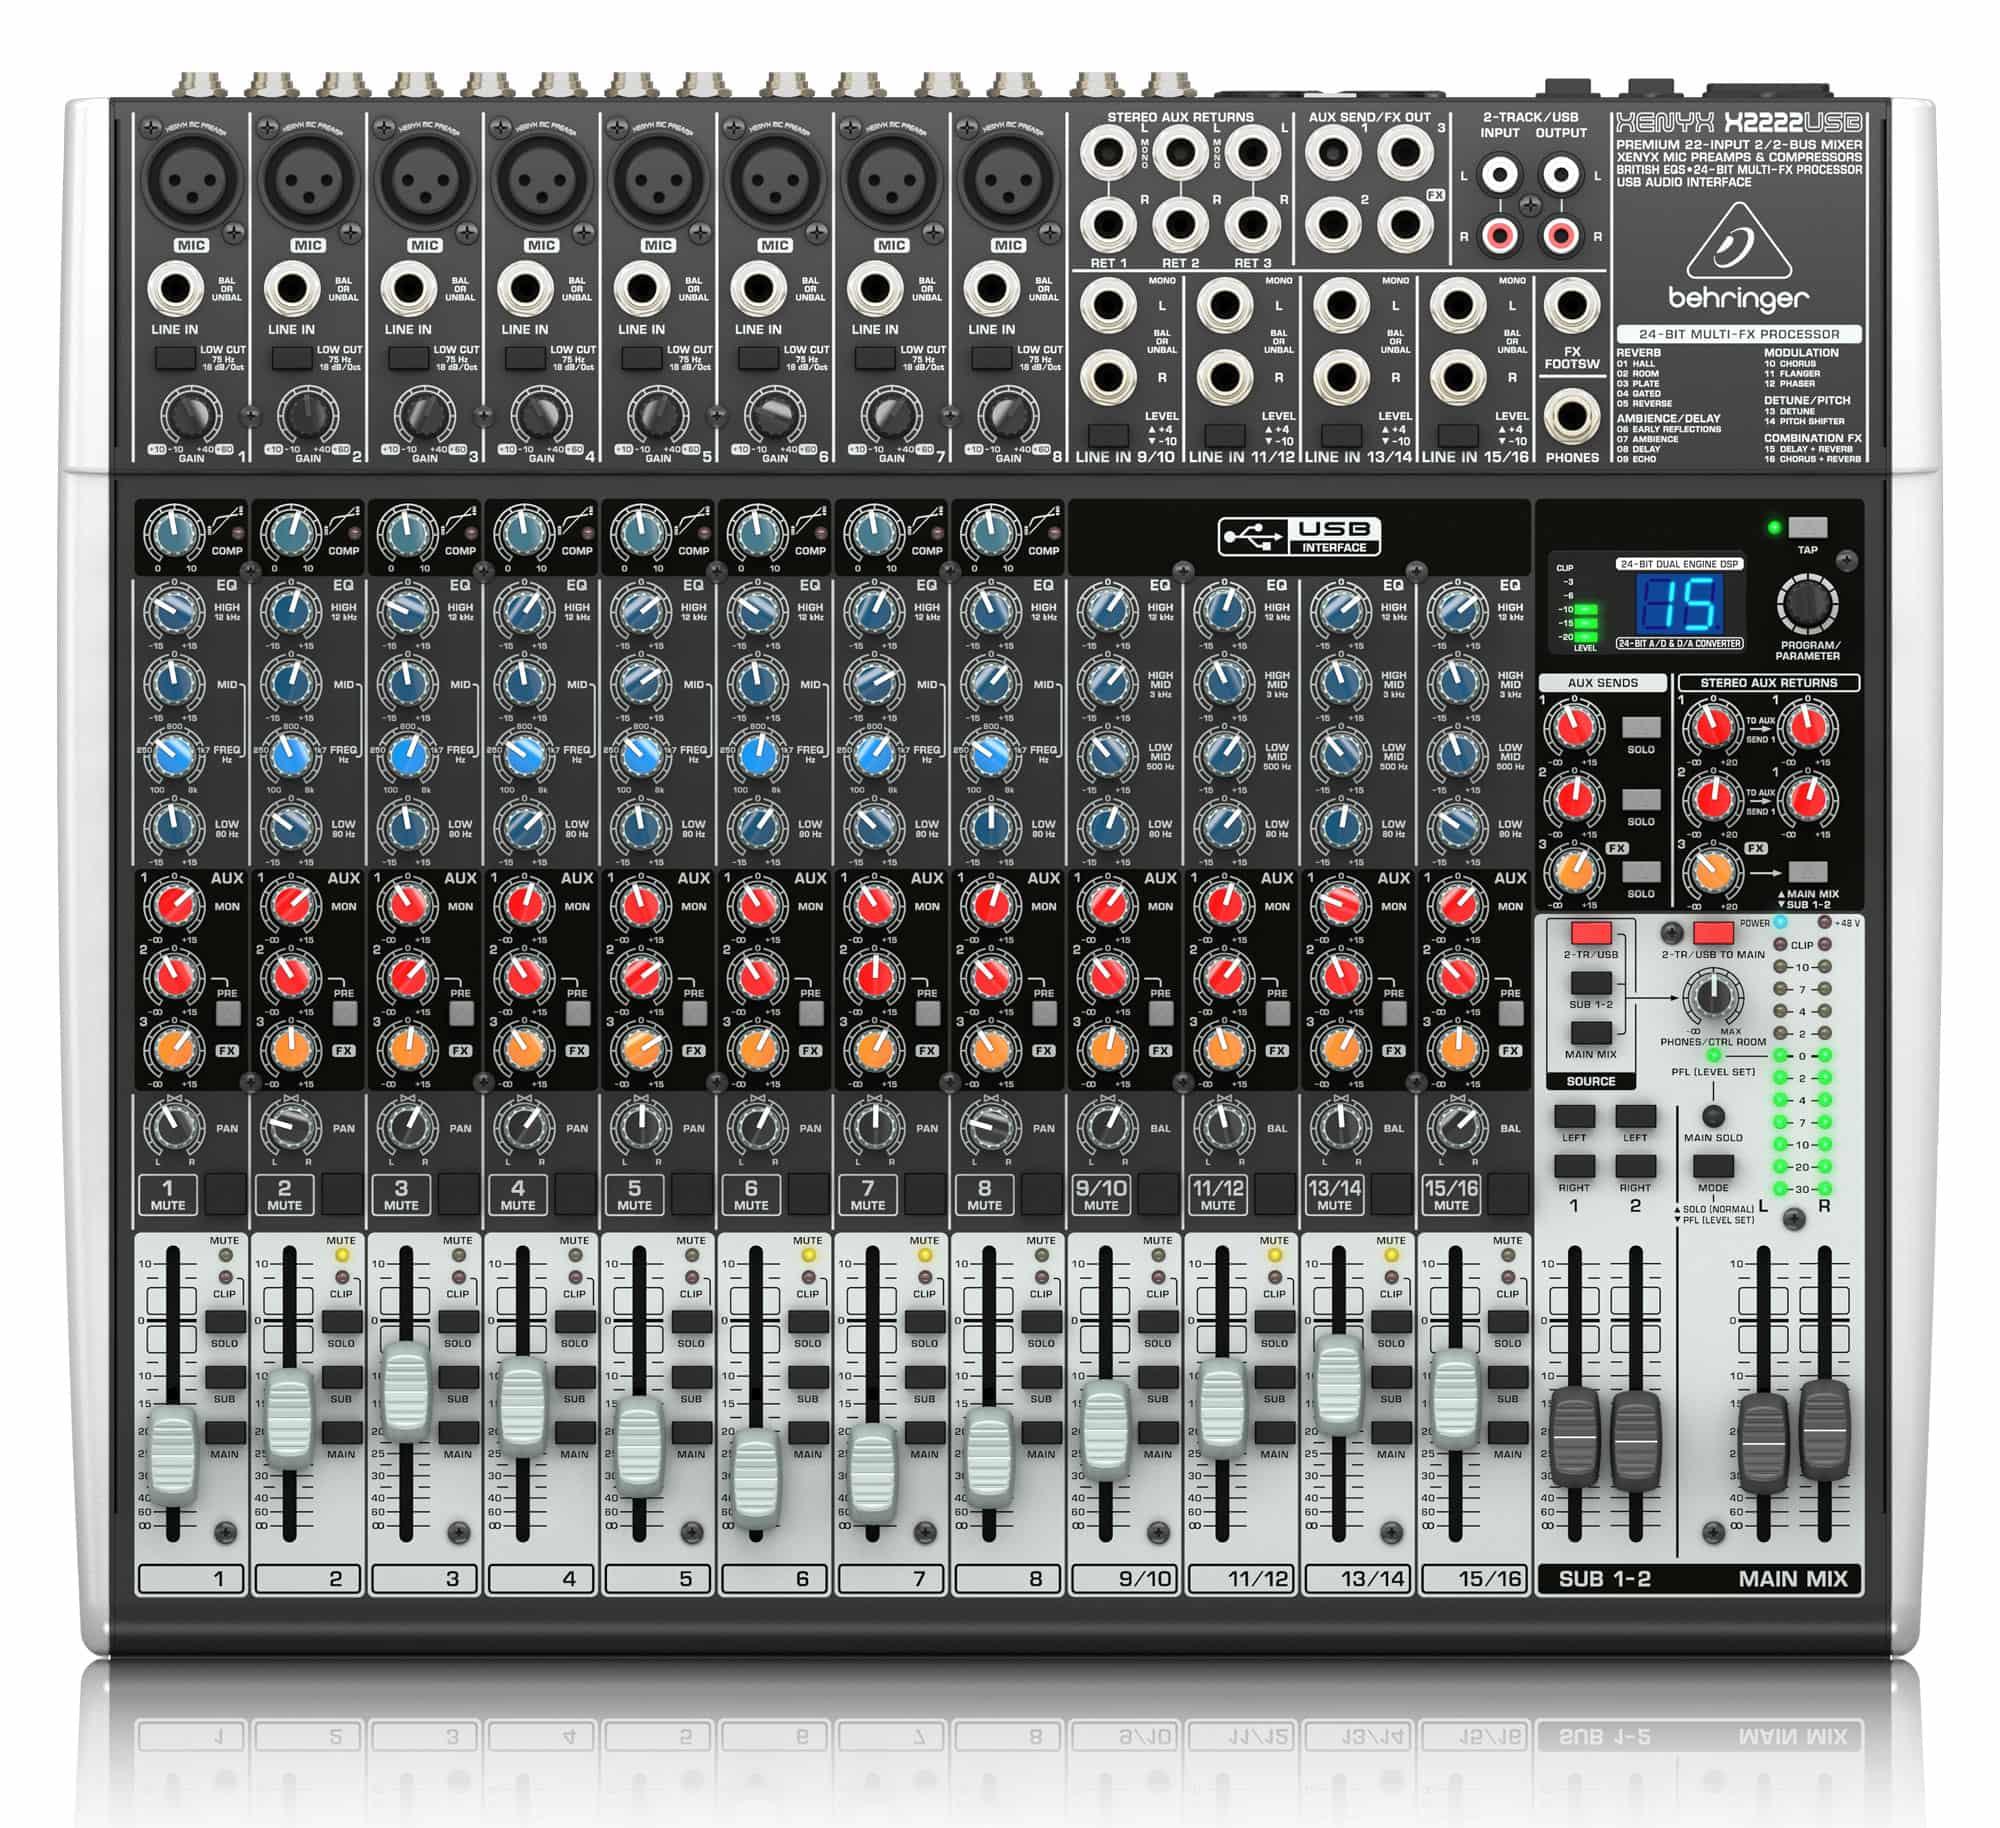 Mischpulte - Behringer Xenyx X2222 USB Mischpult - Onlineshop Musikhaus Kirstein